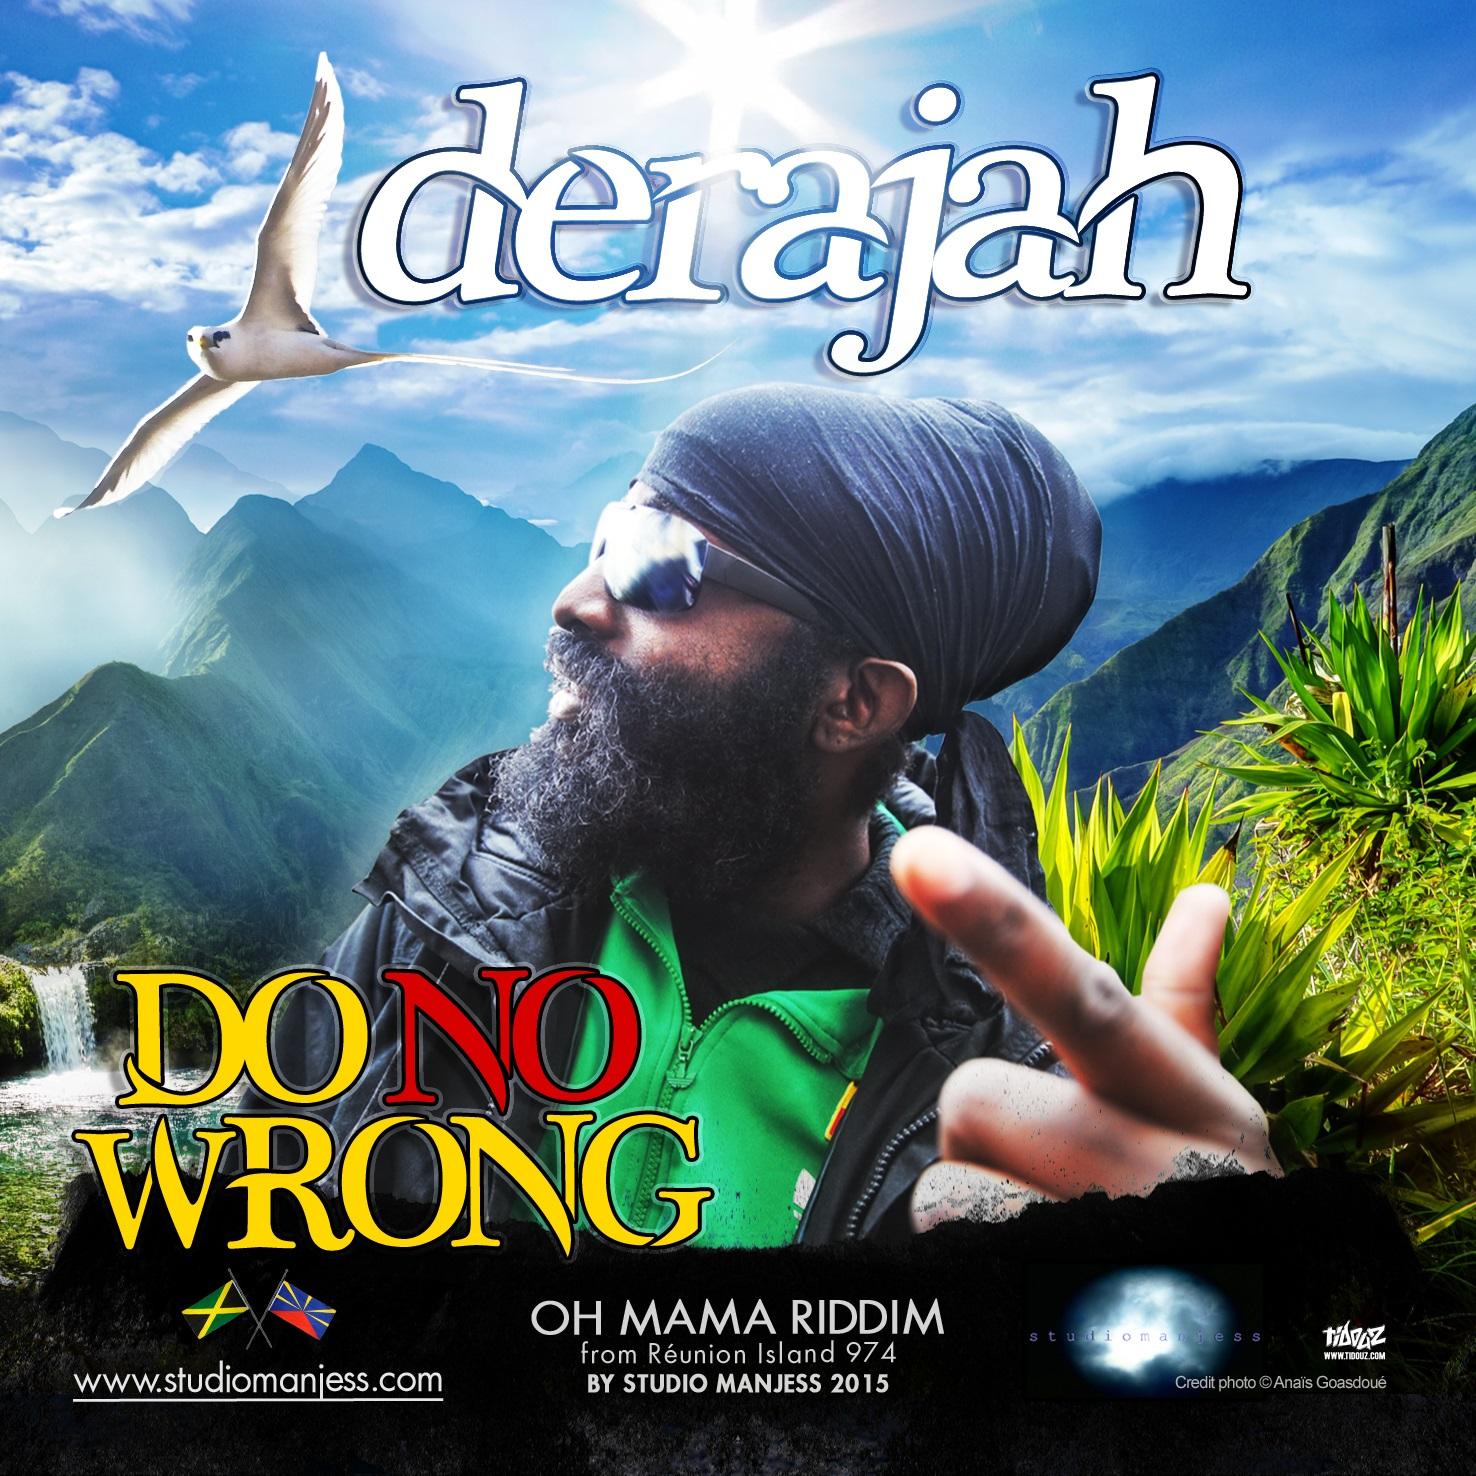 Front derajah do no wrong studio manjess 2015 1 by studiomanjess